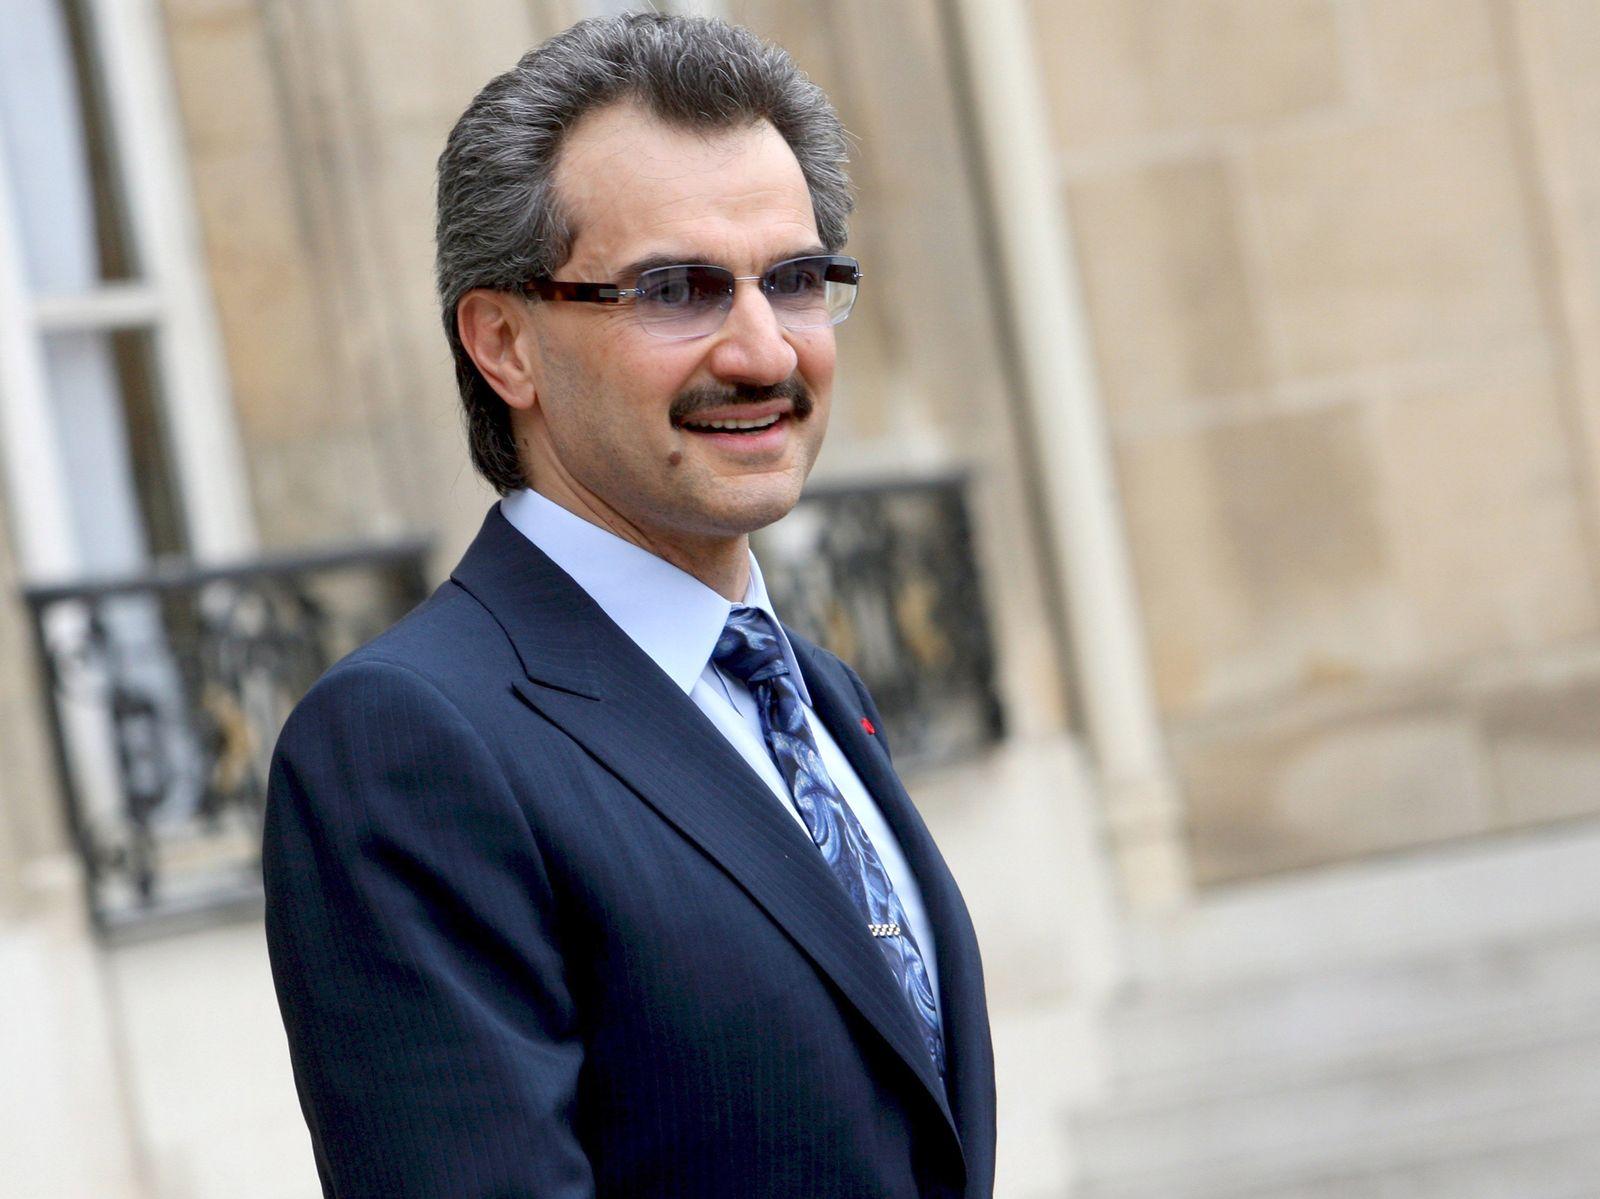 Saudischer Prinz Alwalid bin Talal